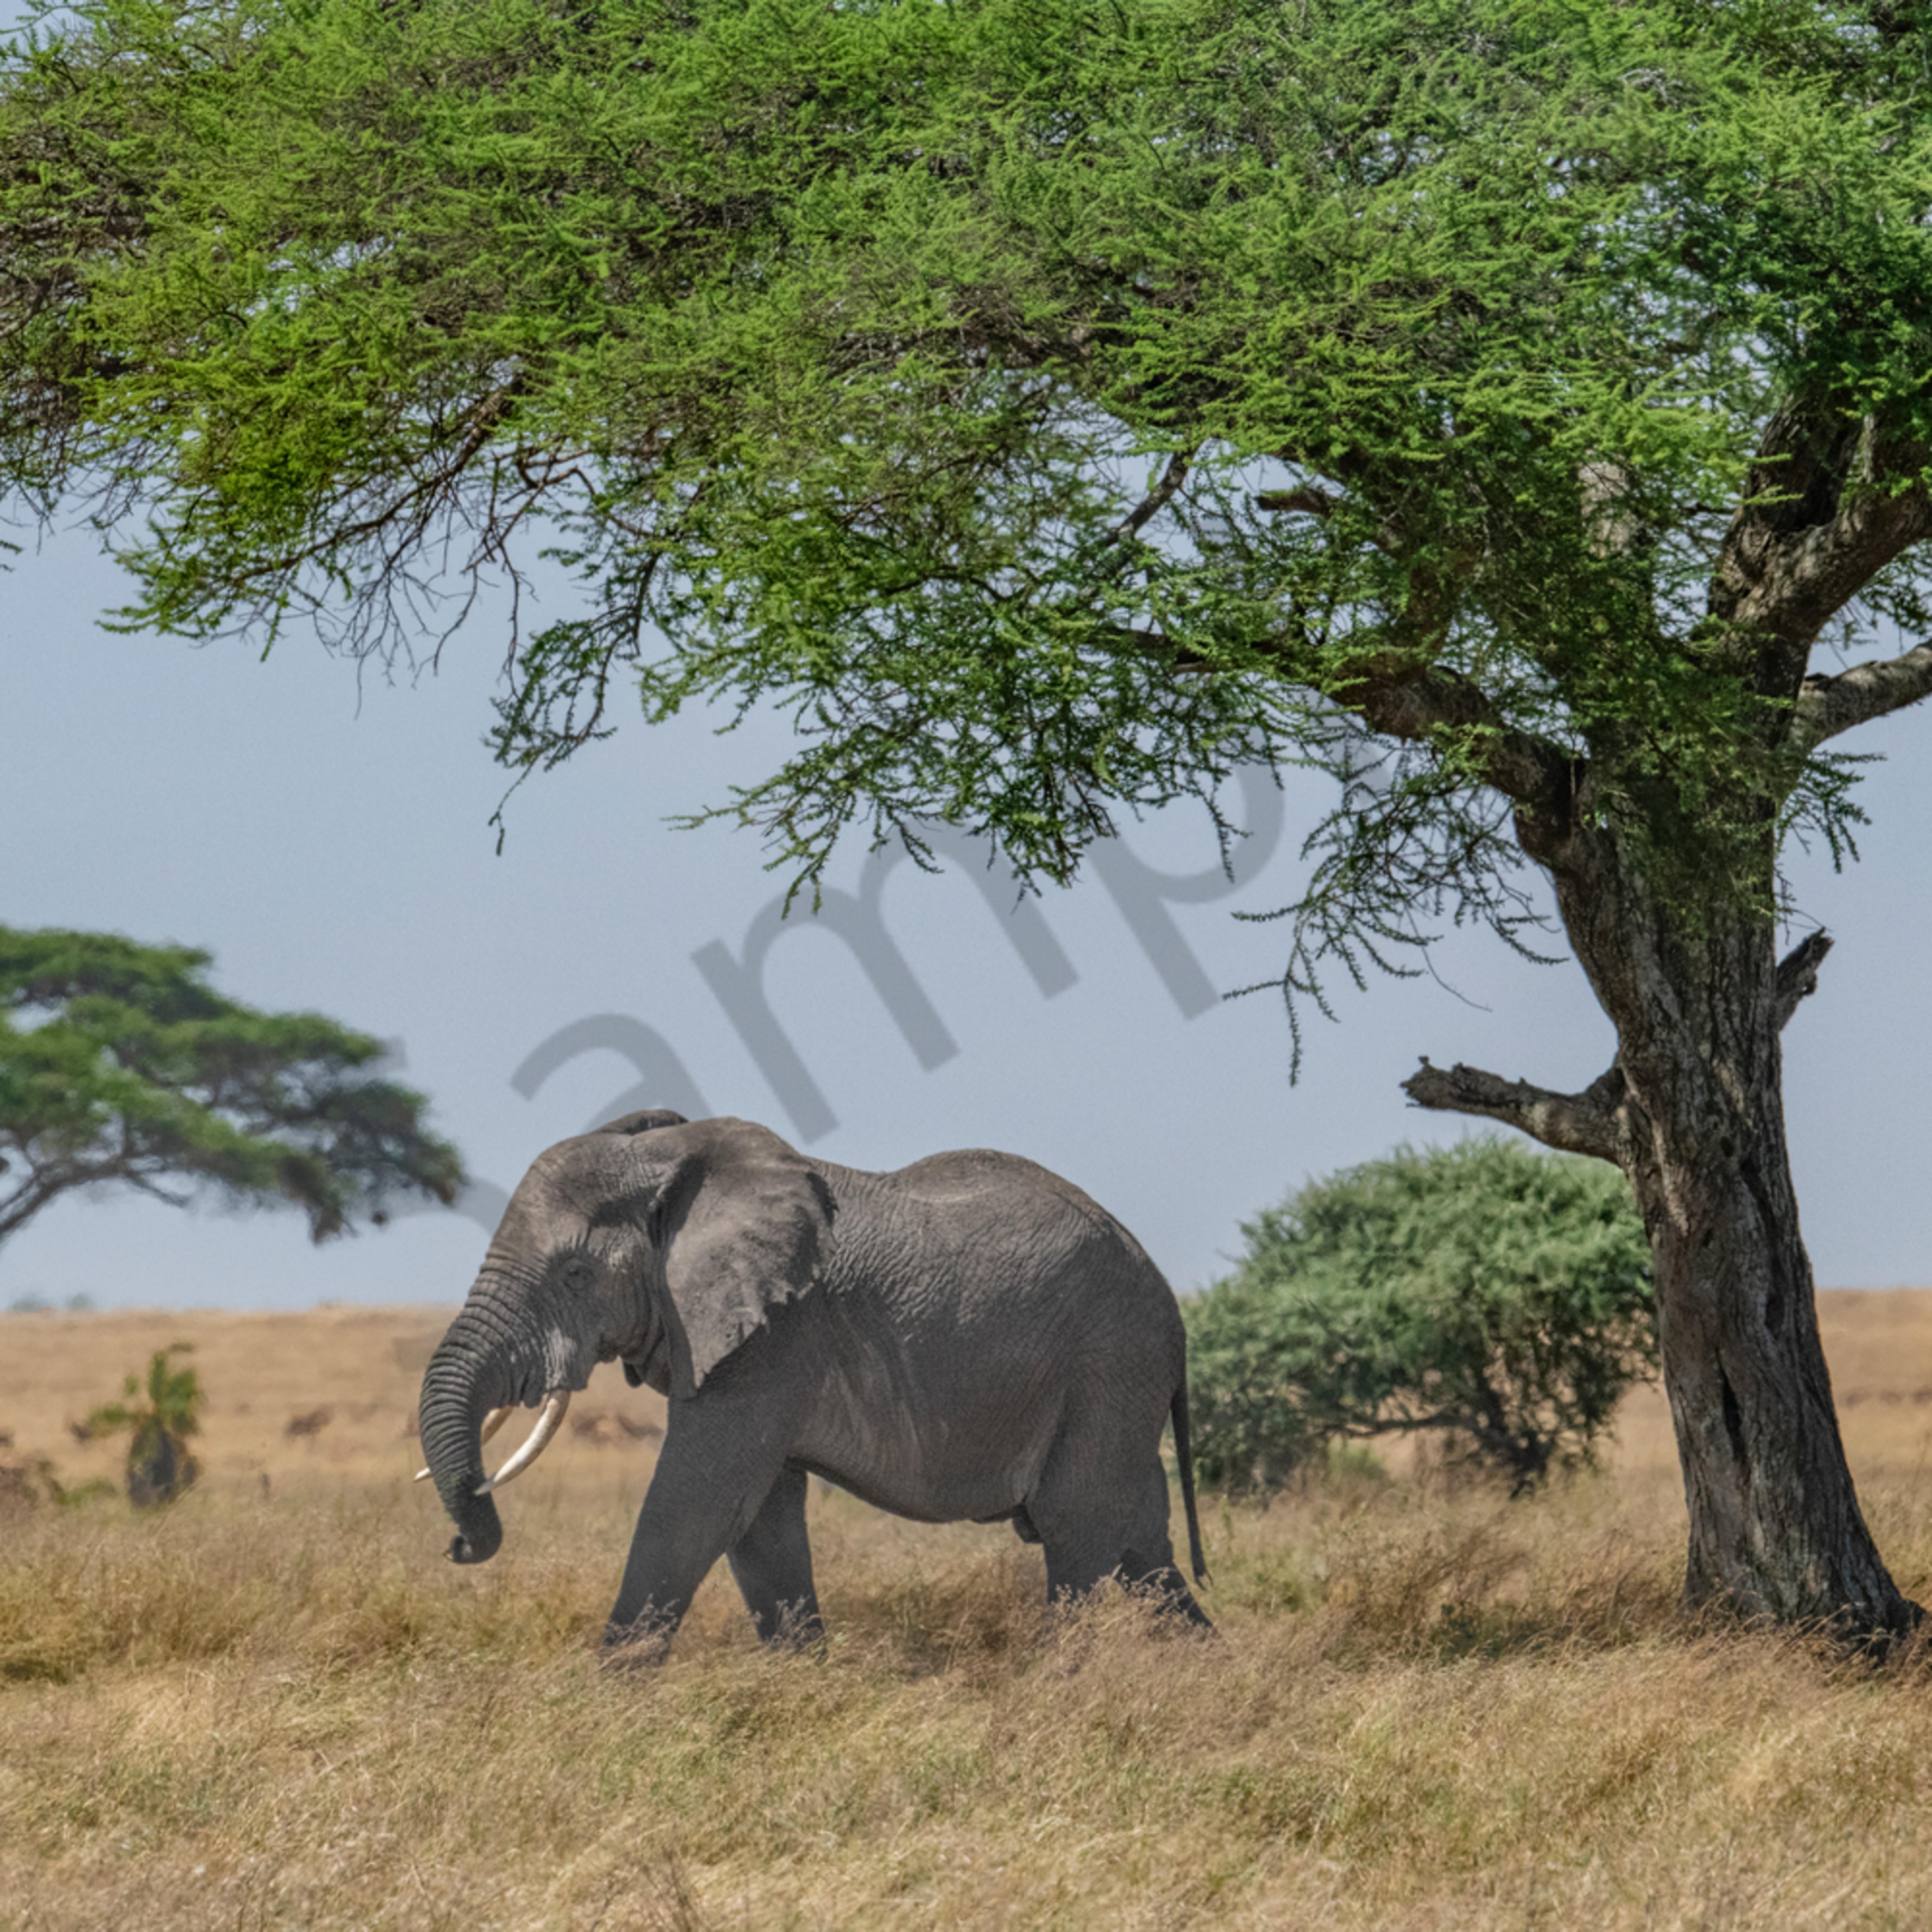 Elephant undr tree ltang2